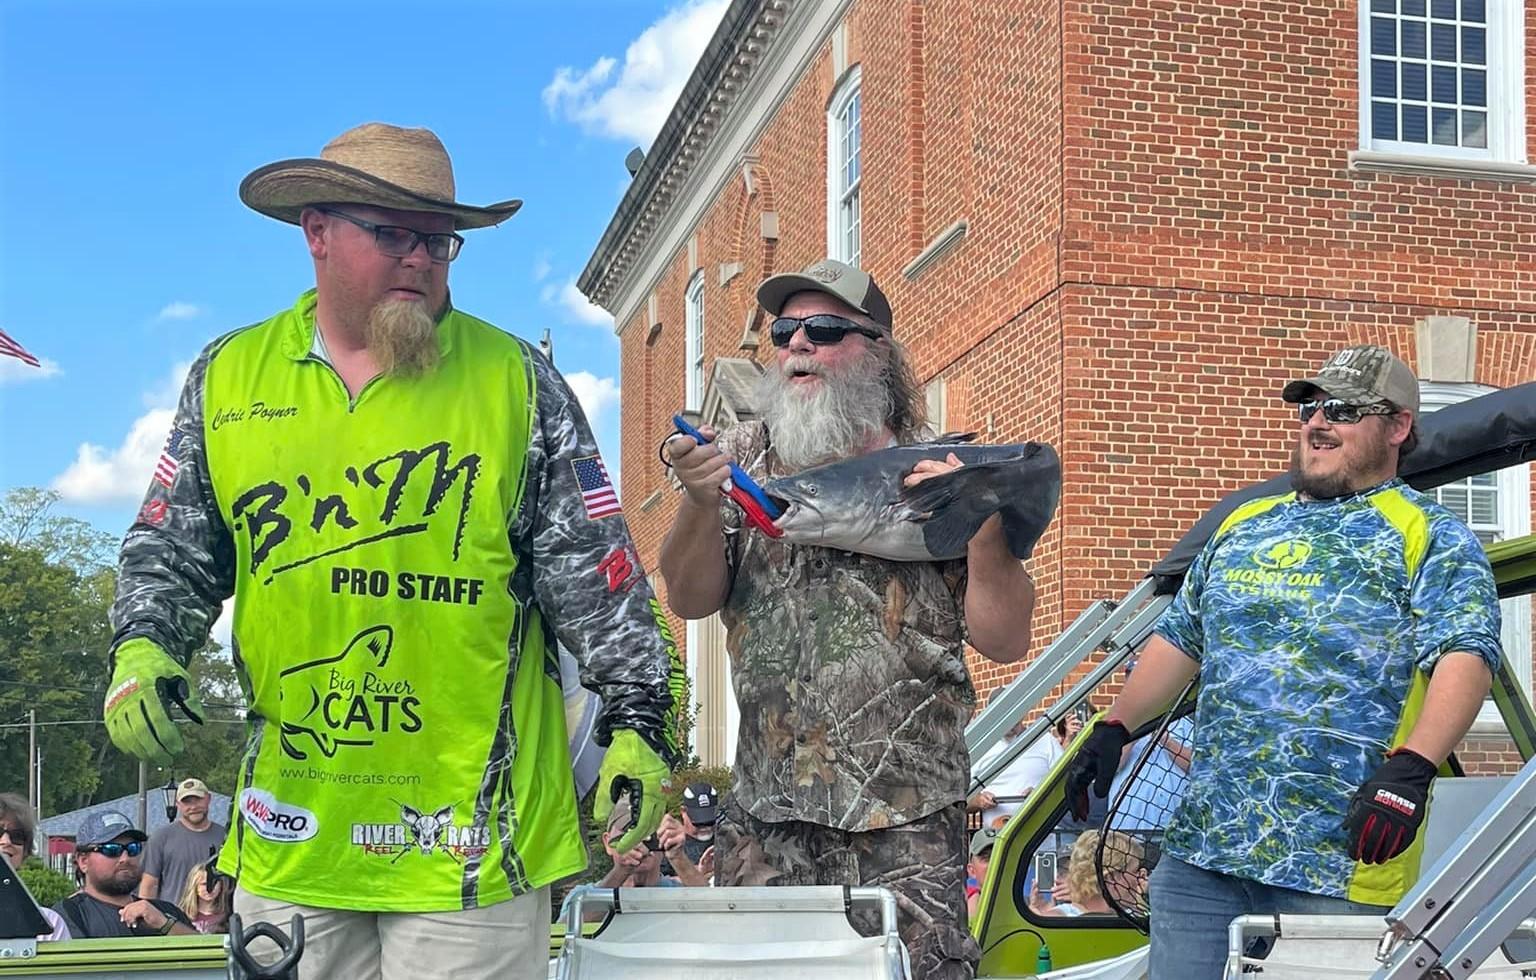 catfish, tournament, WCC, Savannah, Tennessee, blue cats, flatheads, fish care, skipjack, World Championship, Tennessee River, JR Sweat, Tennessee River Productions